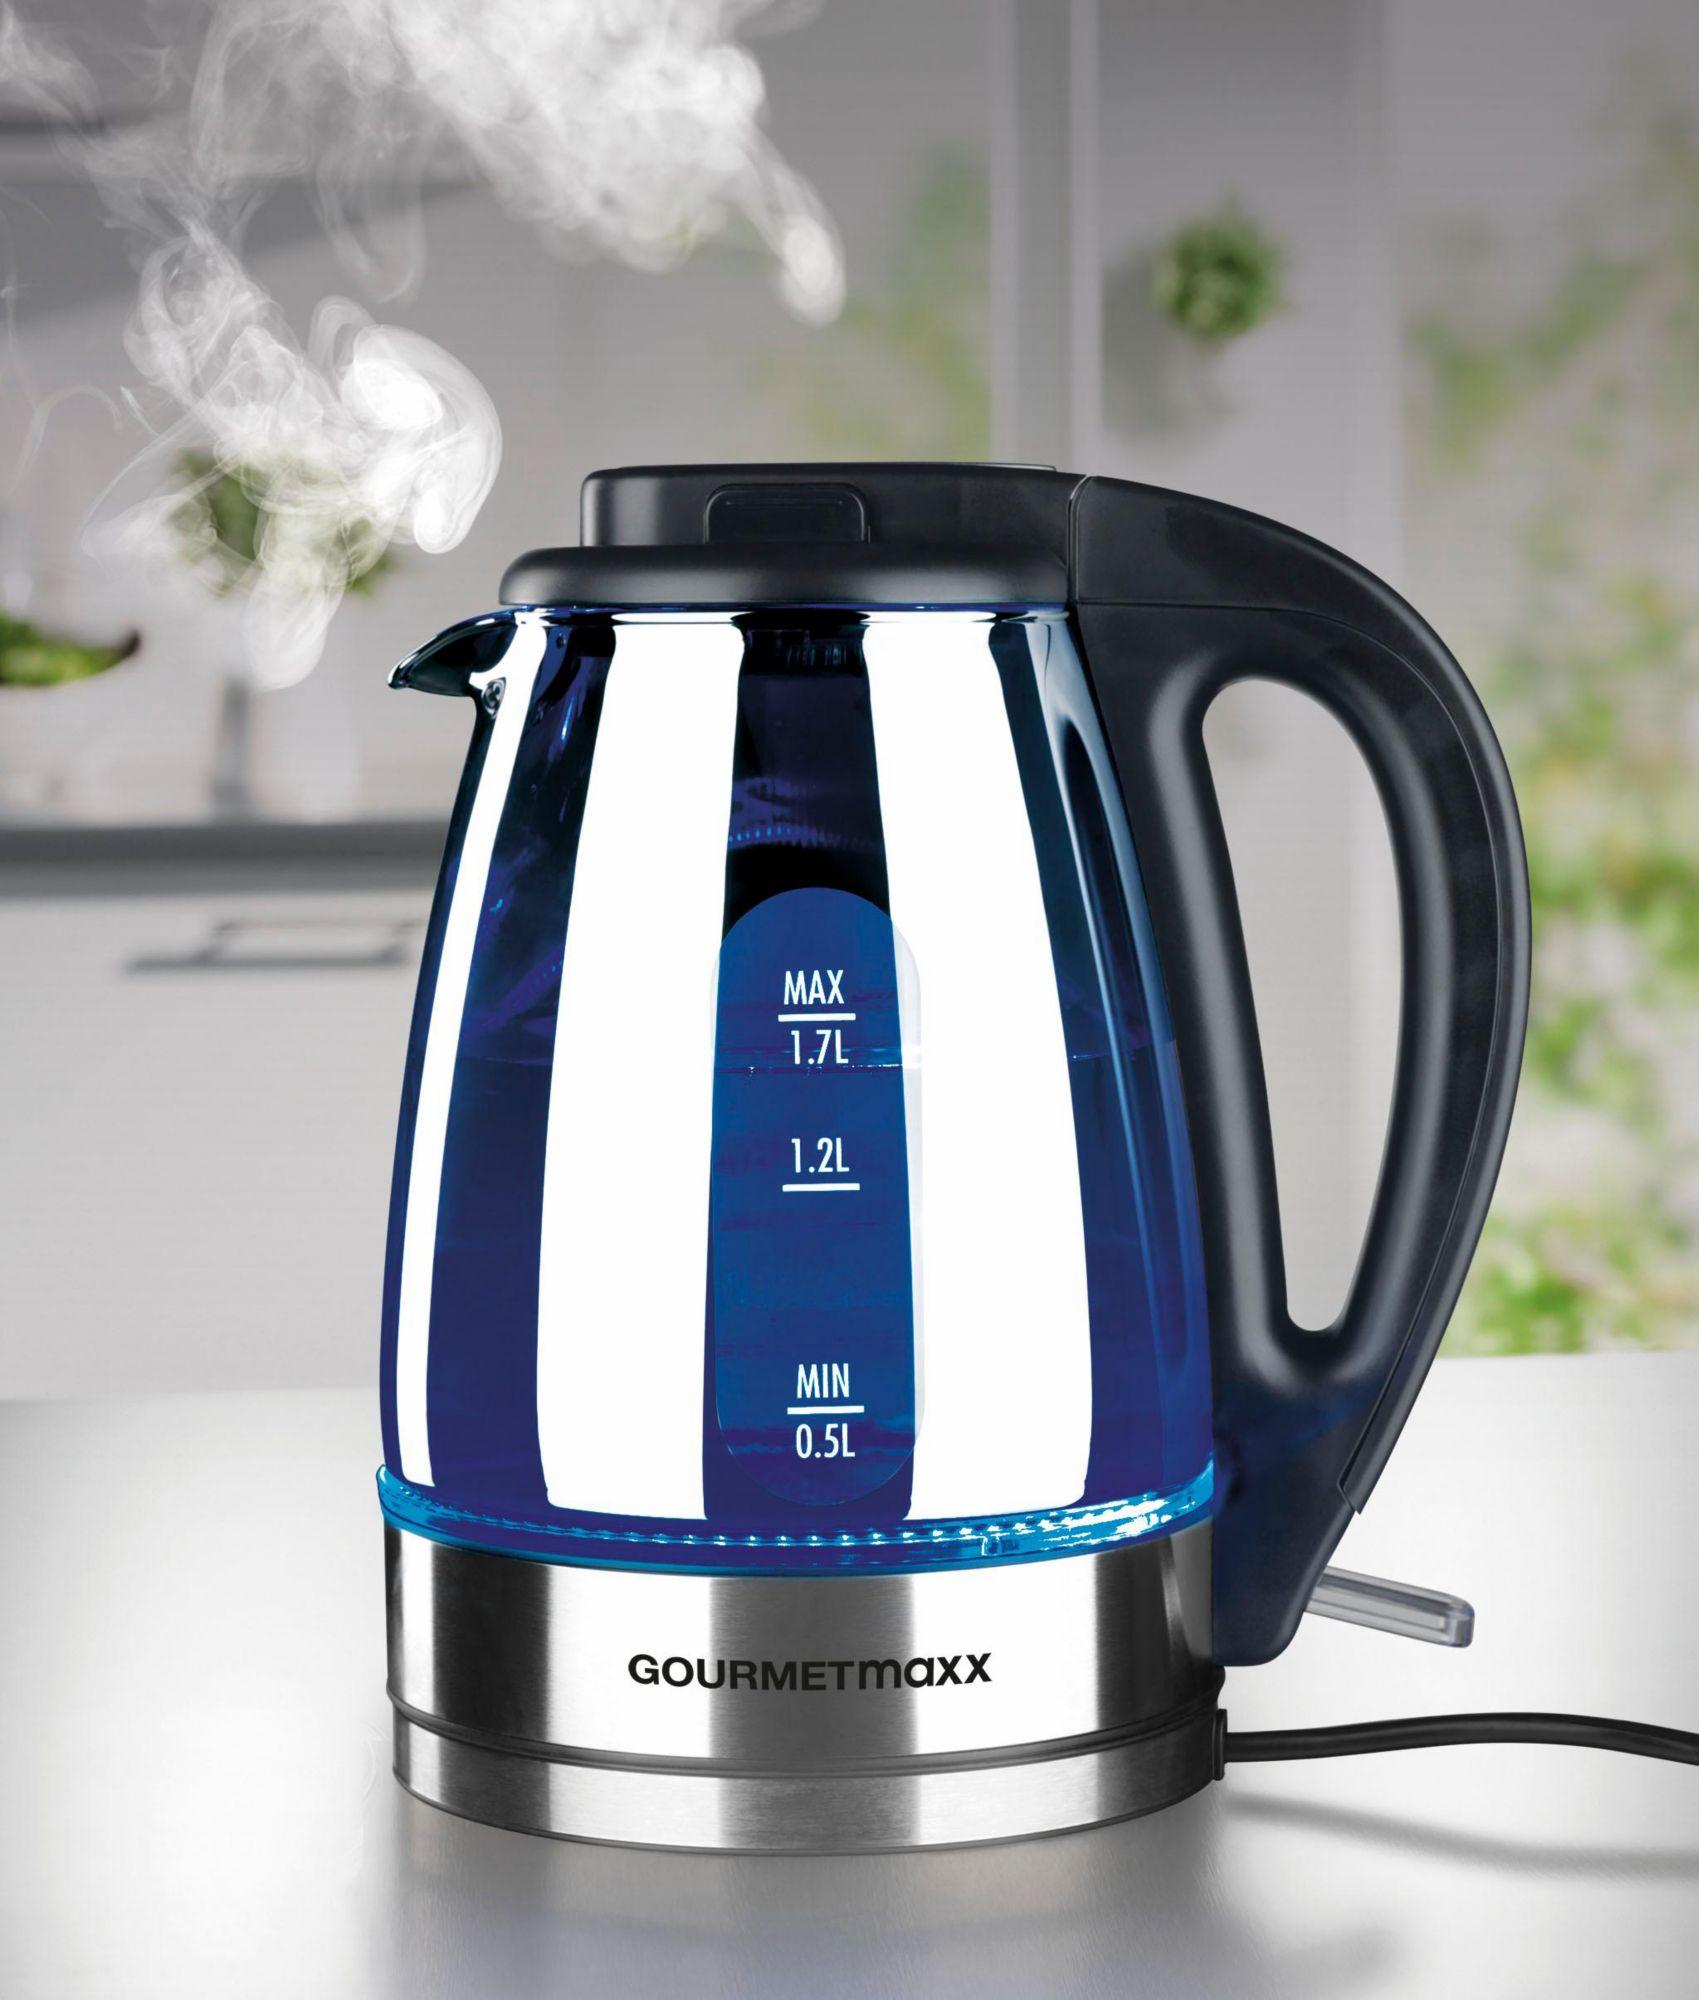 GOURMETMAXX Gourmet Maxx Wasserkocher Glas LED 2000W